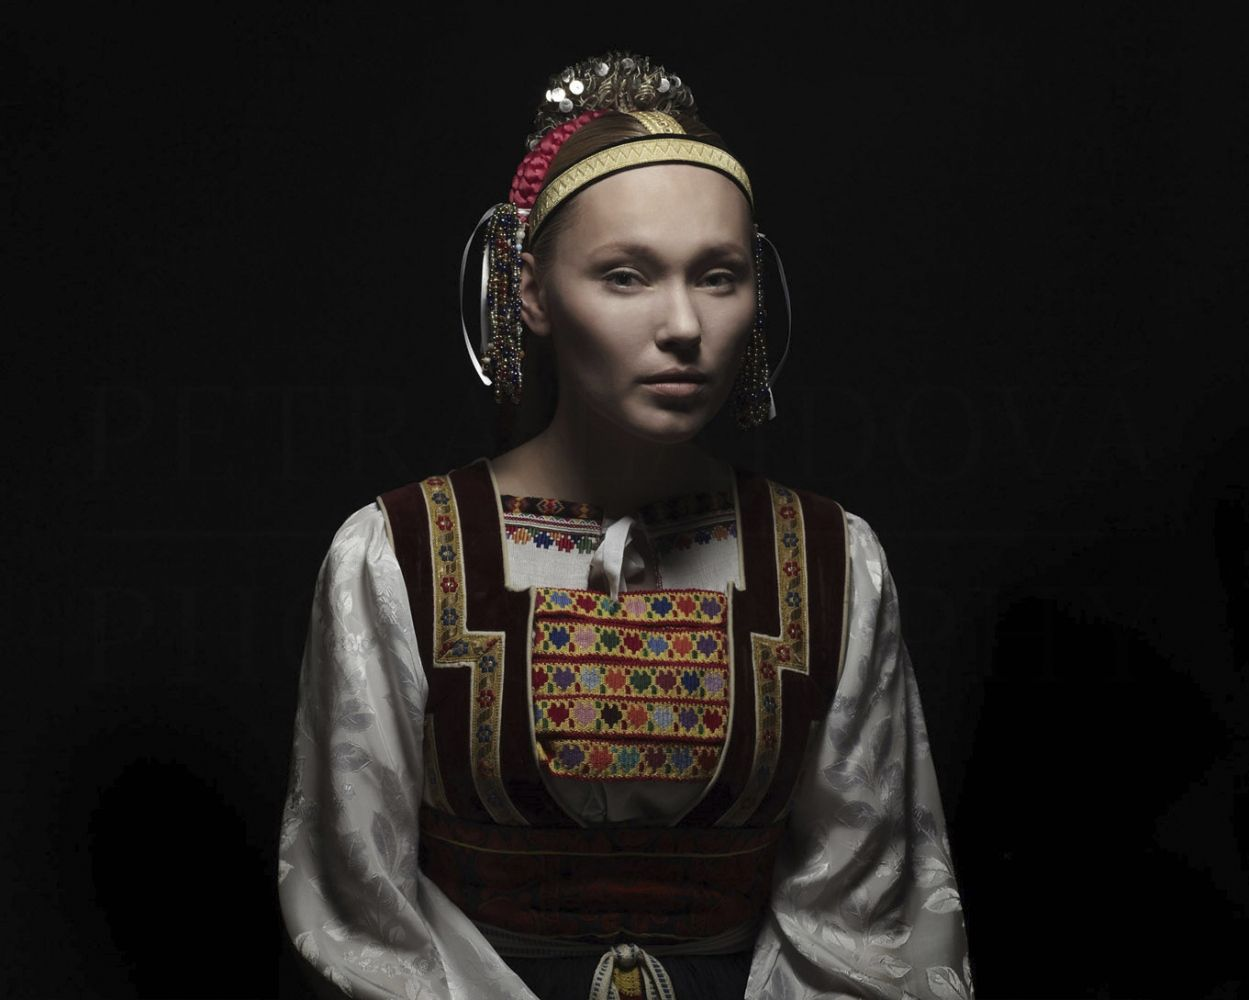 Torysky, Spiš Slovenská Renesancia - Slovenské tradičné umenie a estetika - by Petra Lajdová   Slovenská Renesancia